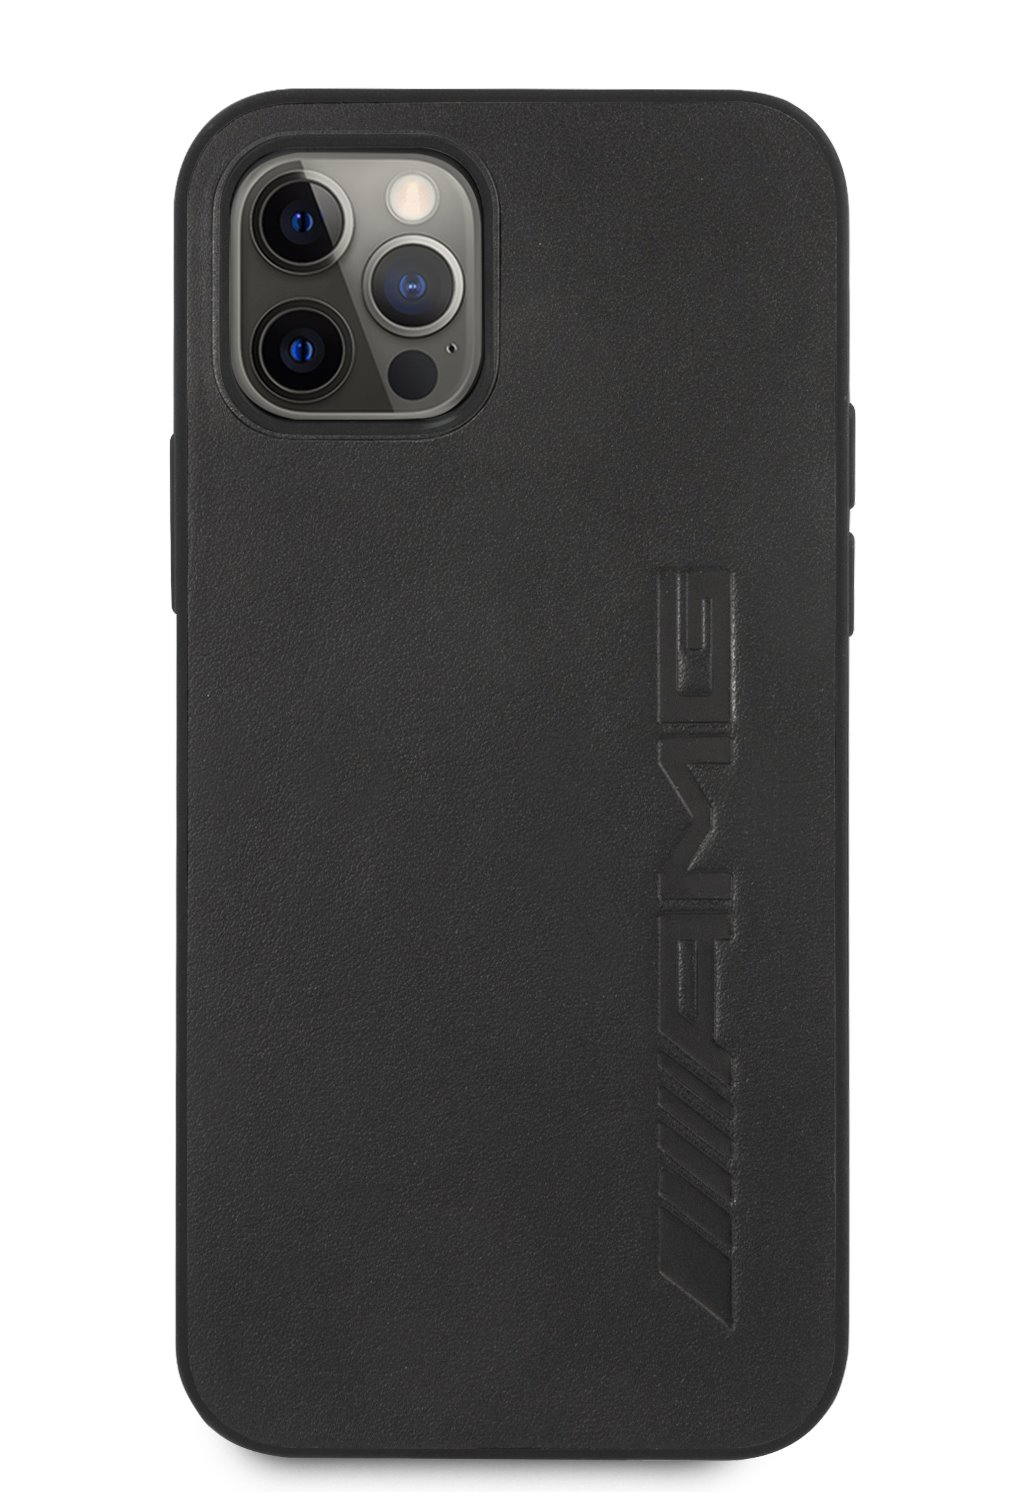 AMHCP12LDOLBK AMG Leather Big Stamped Logo Zadní Kryt pro iPhone 12 Pro Max 6.7 Black 3666339002855